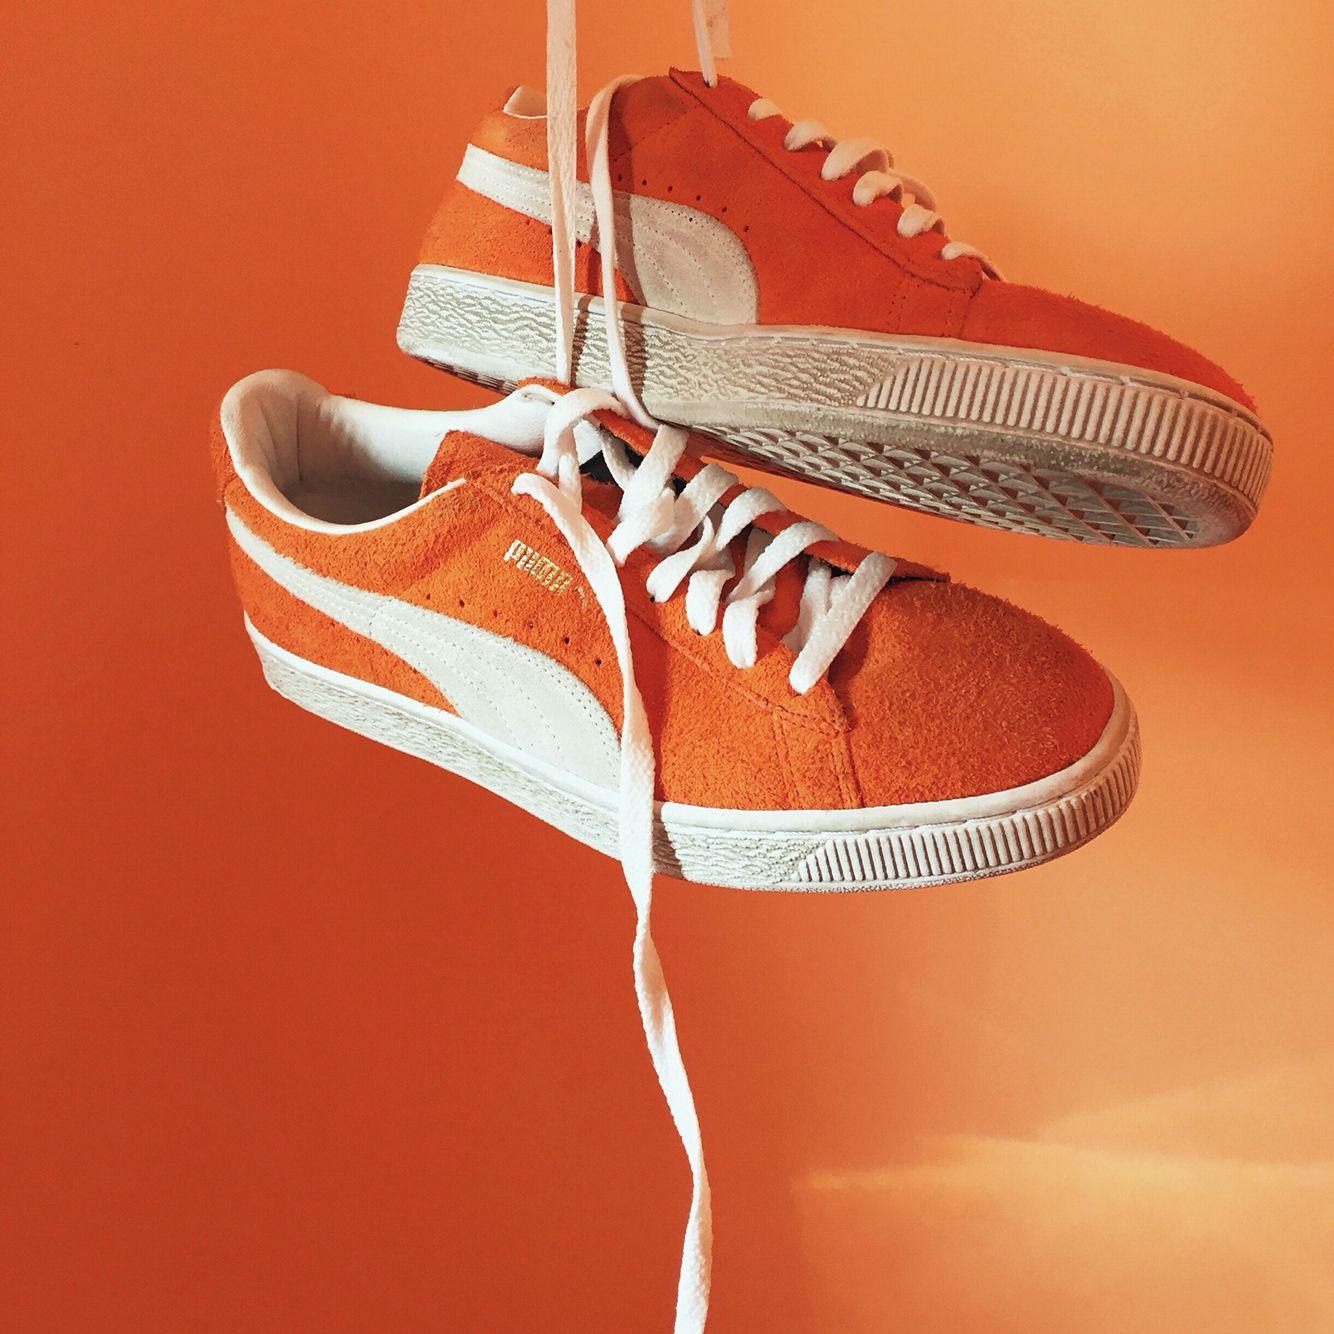 Puma suede orange outfit Style vintage